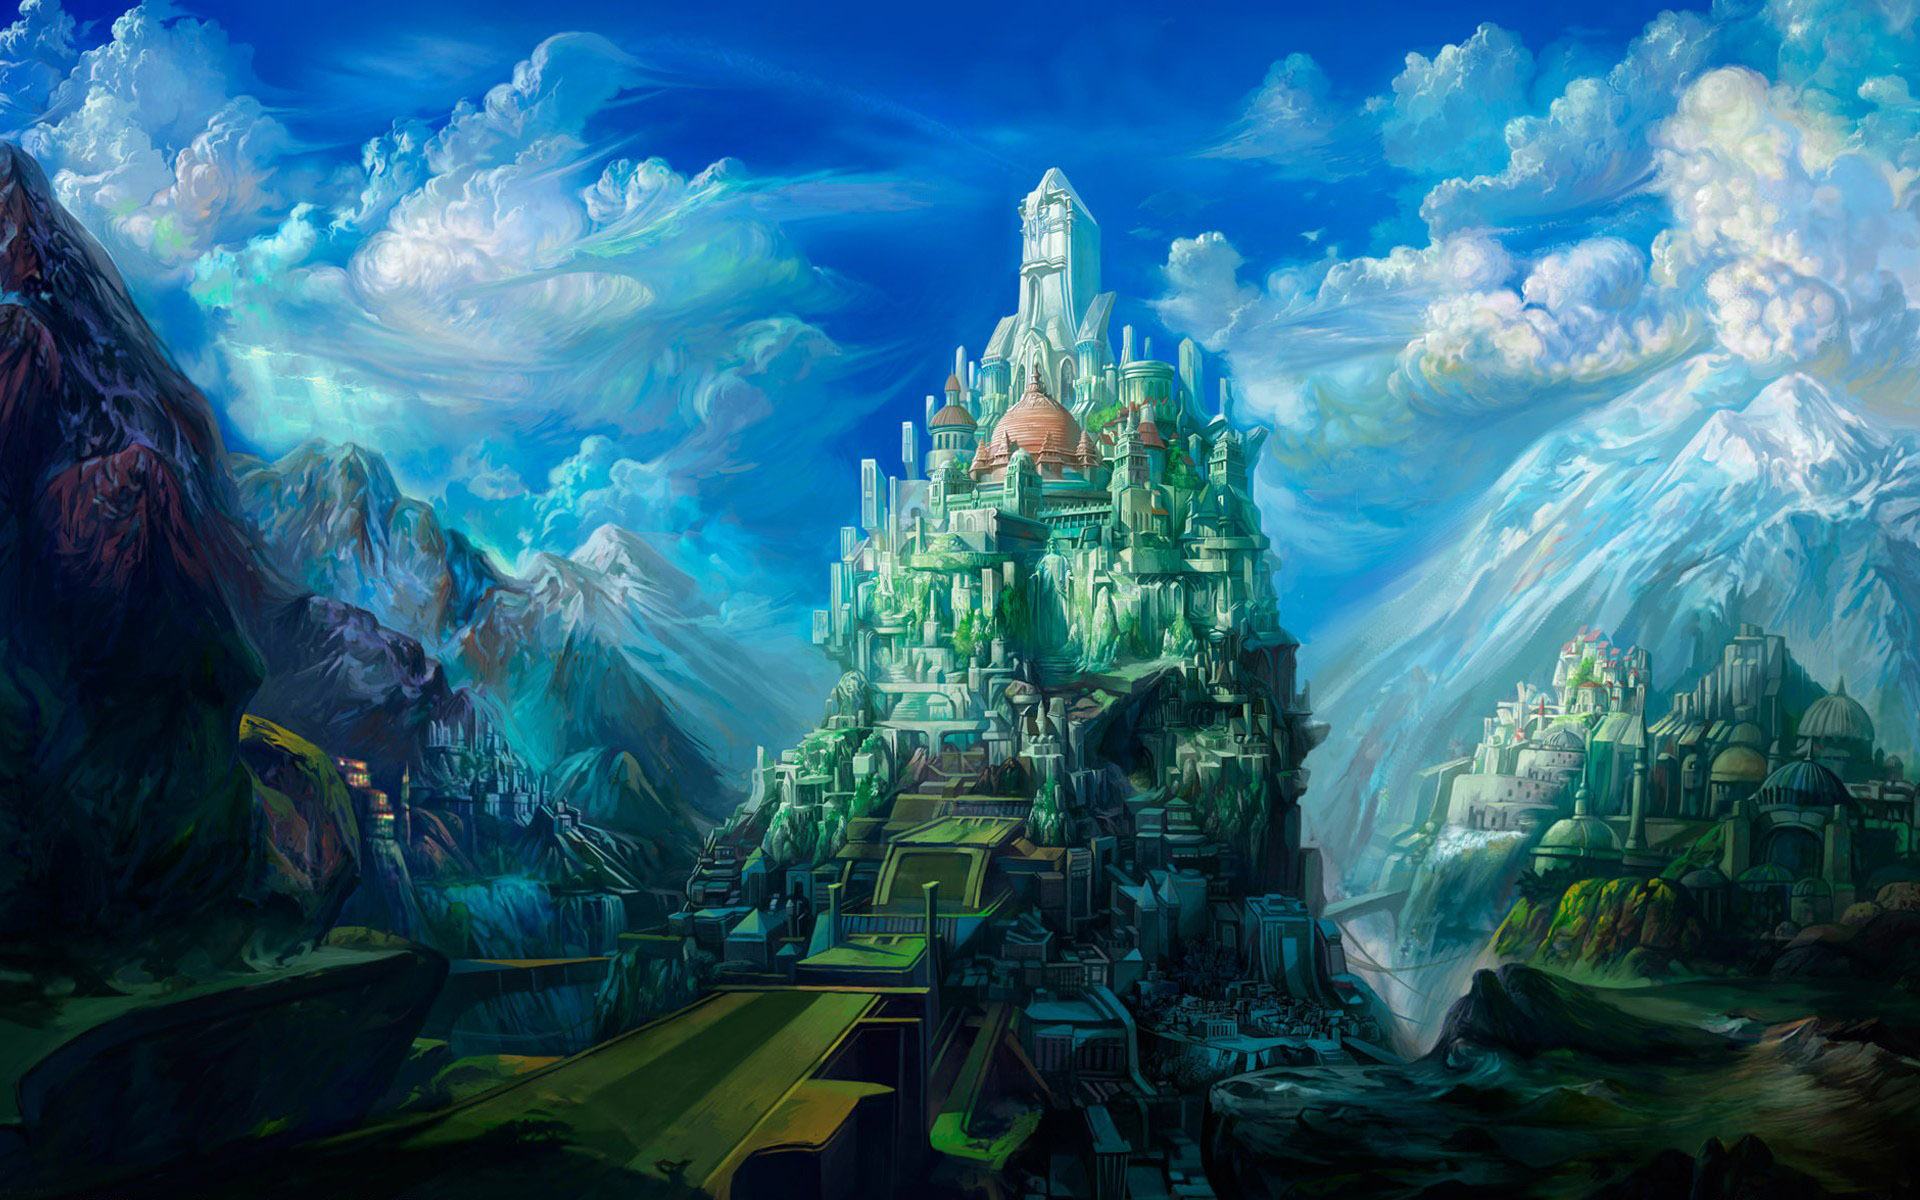 Fantasy Wallpaper Hd wallpaper   137949 1920x1200